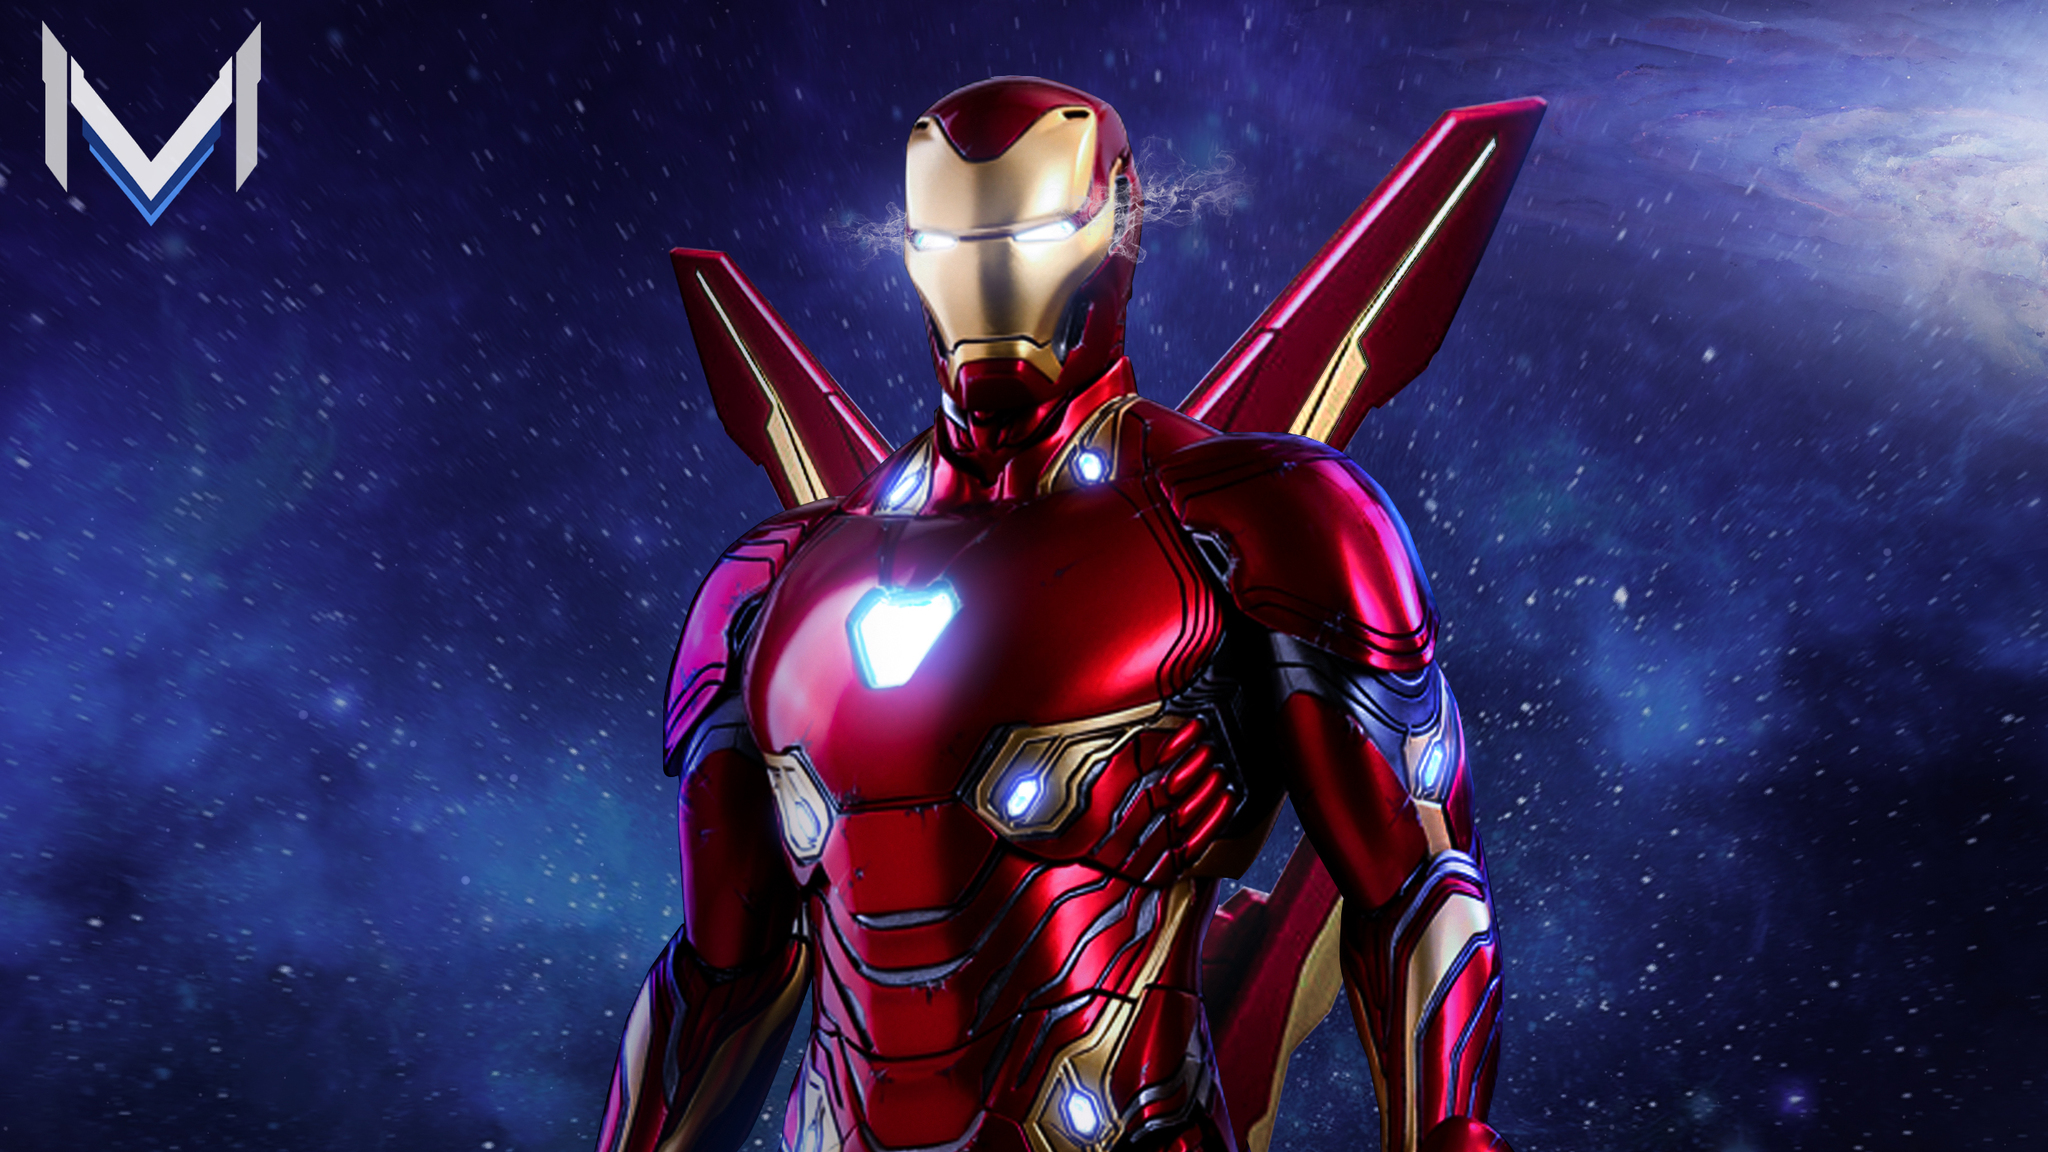 Iron Man Avengers Infinity War Suit Artwork 67